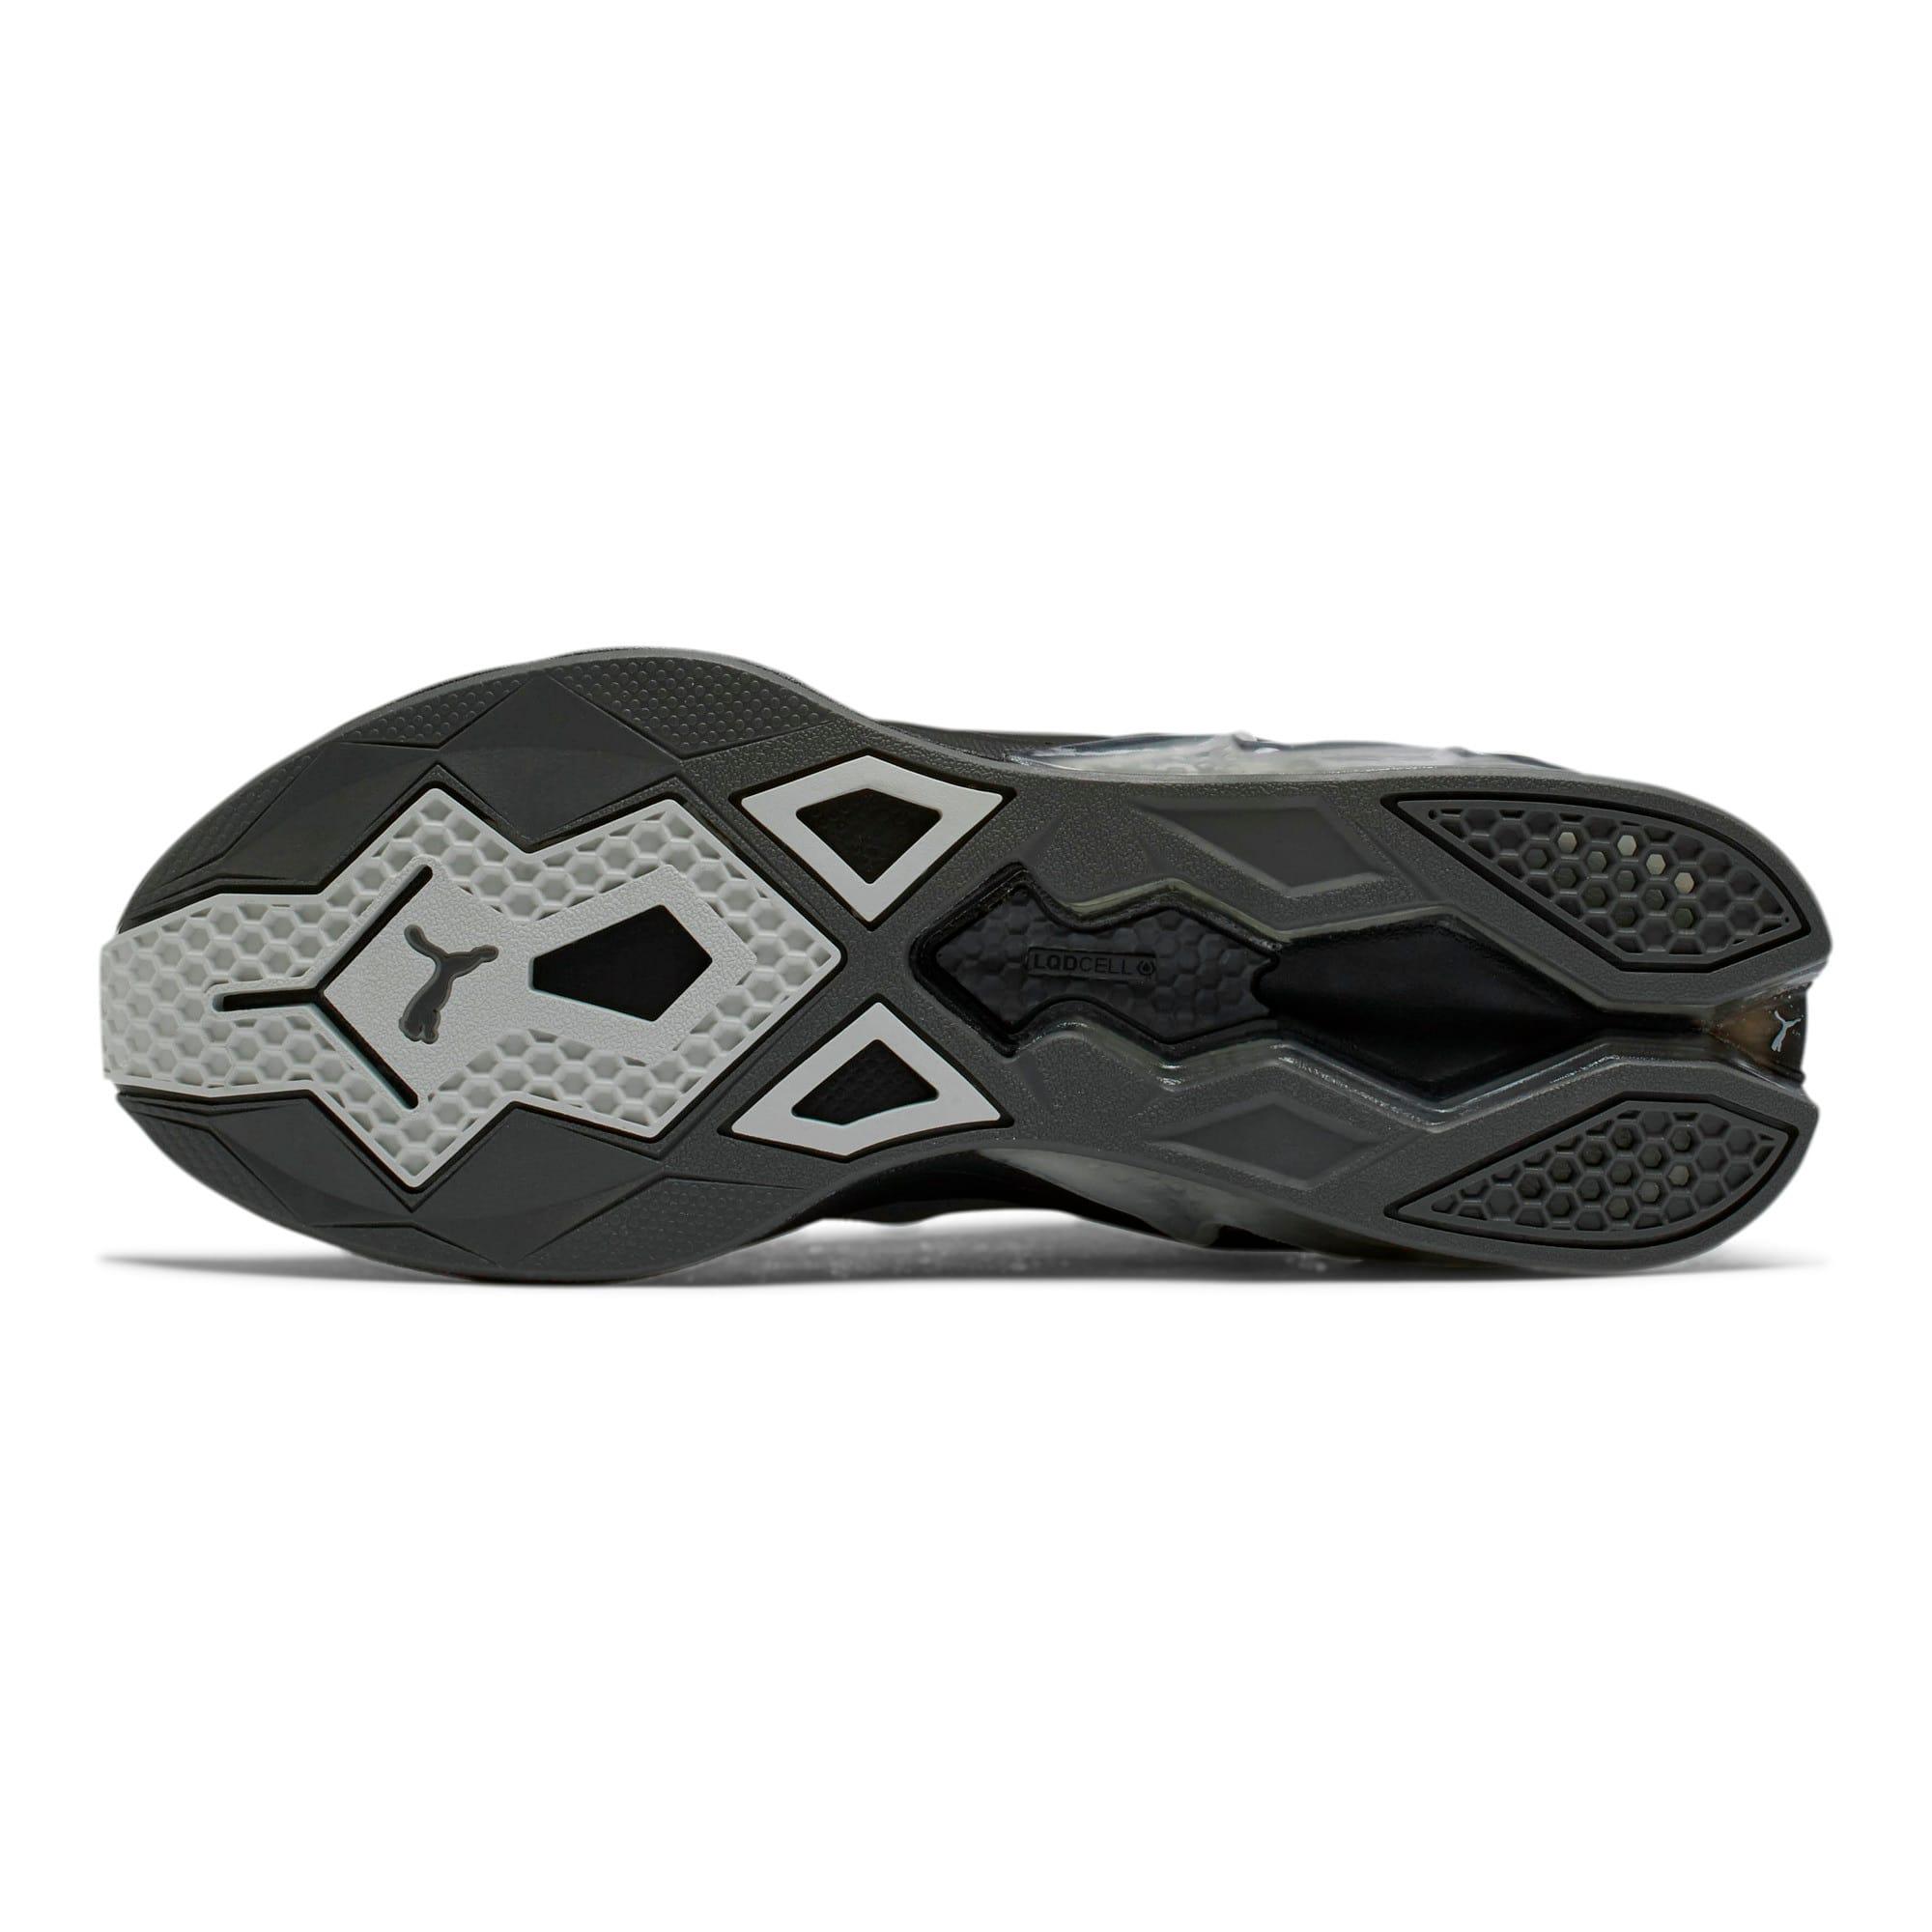 Thumbnail 5 of LQDCELL Origin Tech Men's Training Shoes, Puma Black-CASTLEROCK, medium